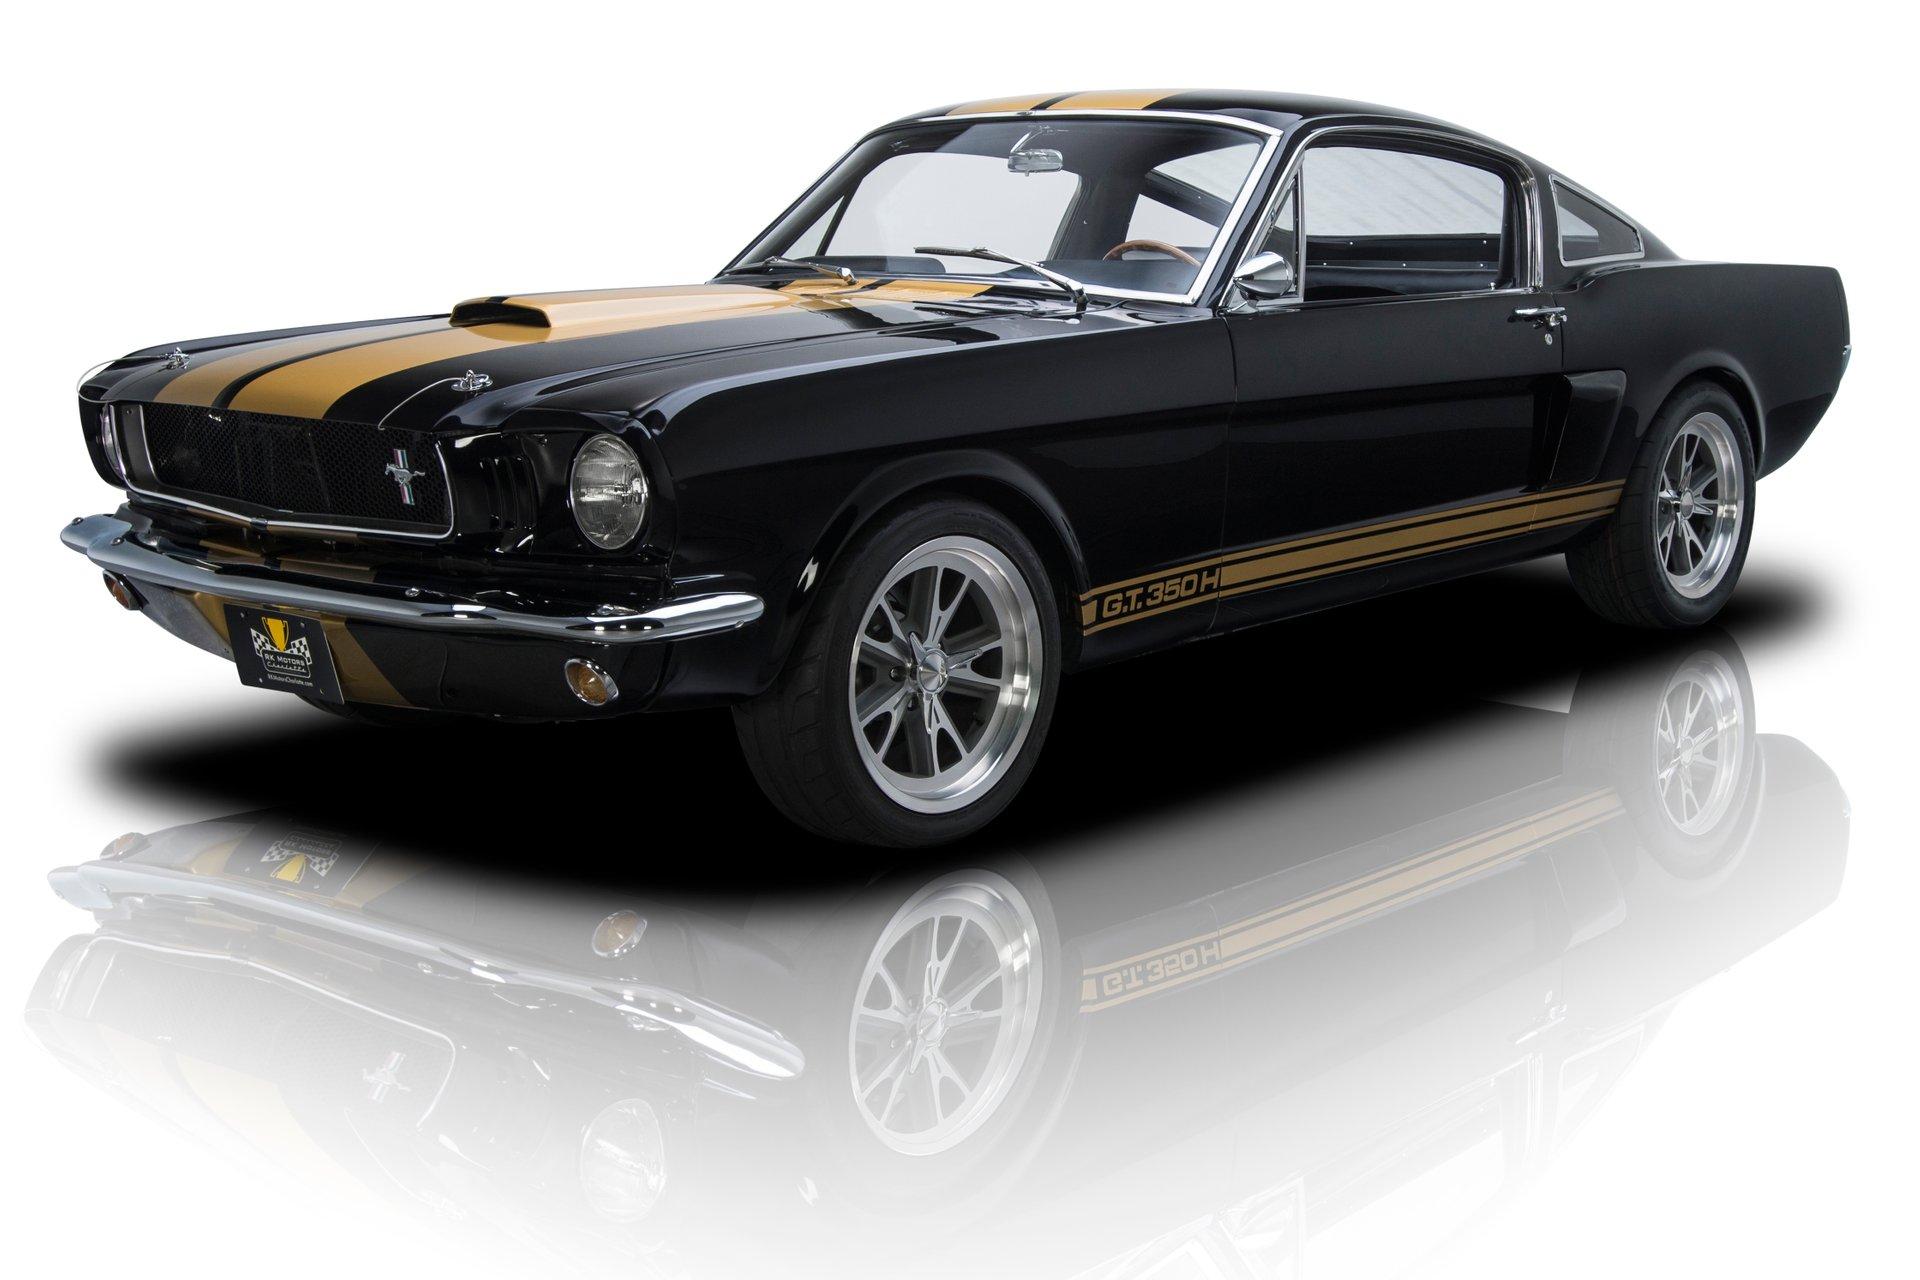 hight resolution of rotisserie built mustang gt dss racing 331 v8 tremec 5 speed ps a c disc brakes